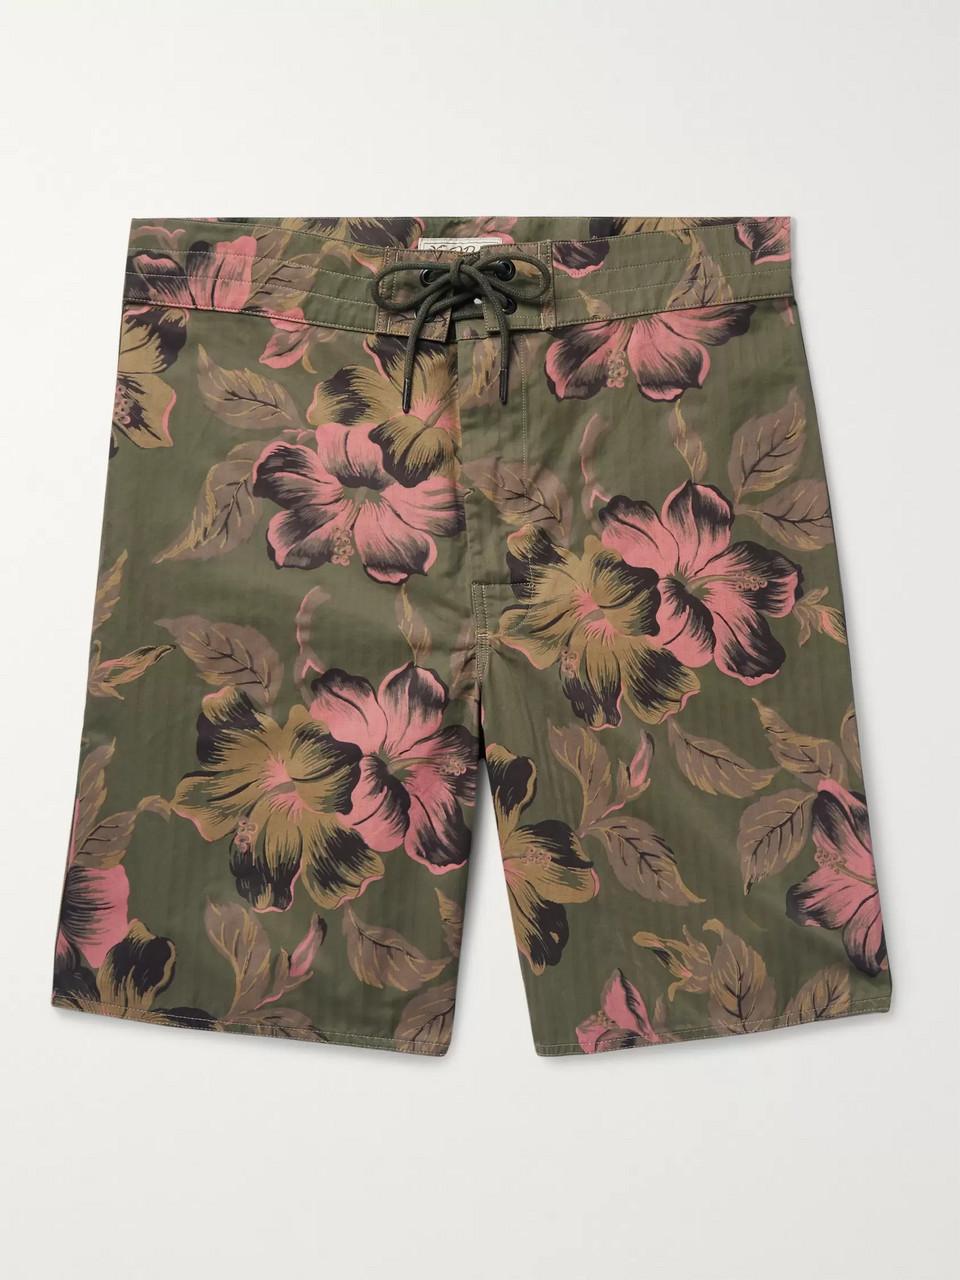 ea8dc15b2a Swim Shorts & Swimwear | Designer Menswear | MR PORTER